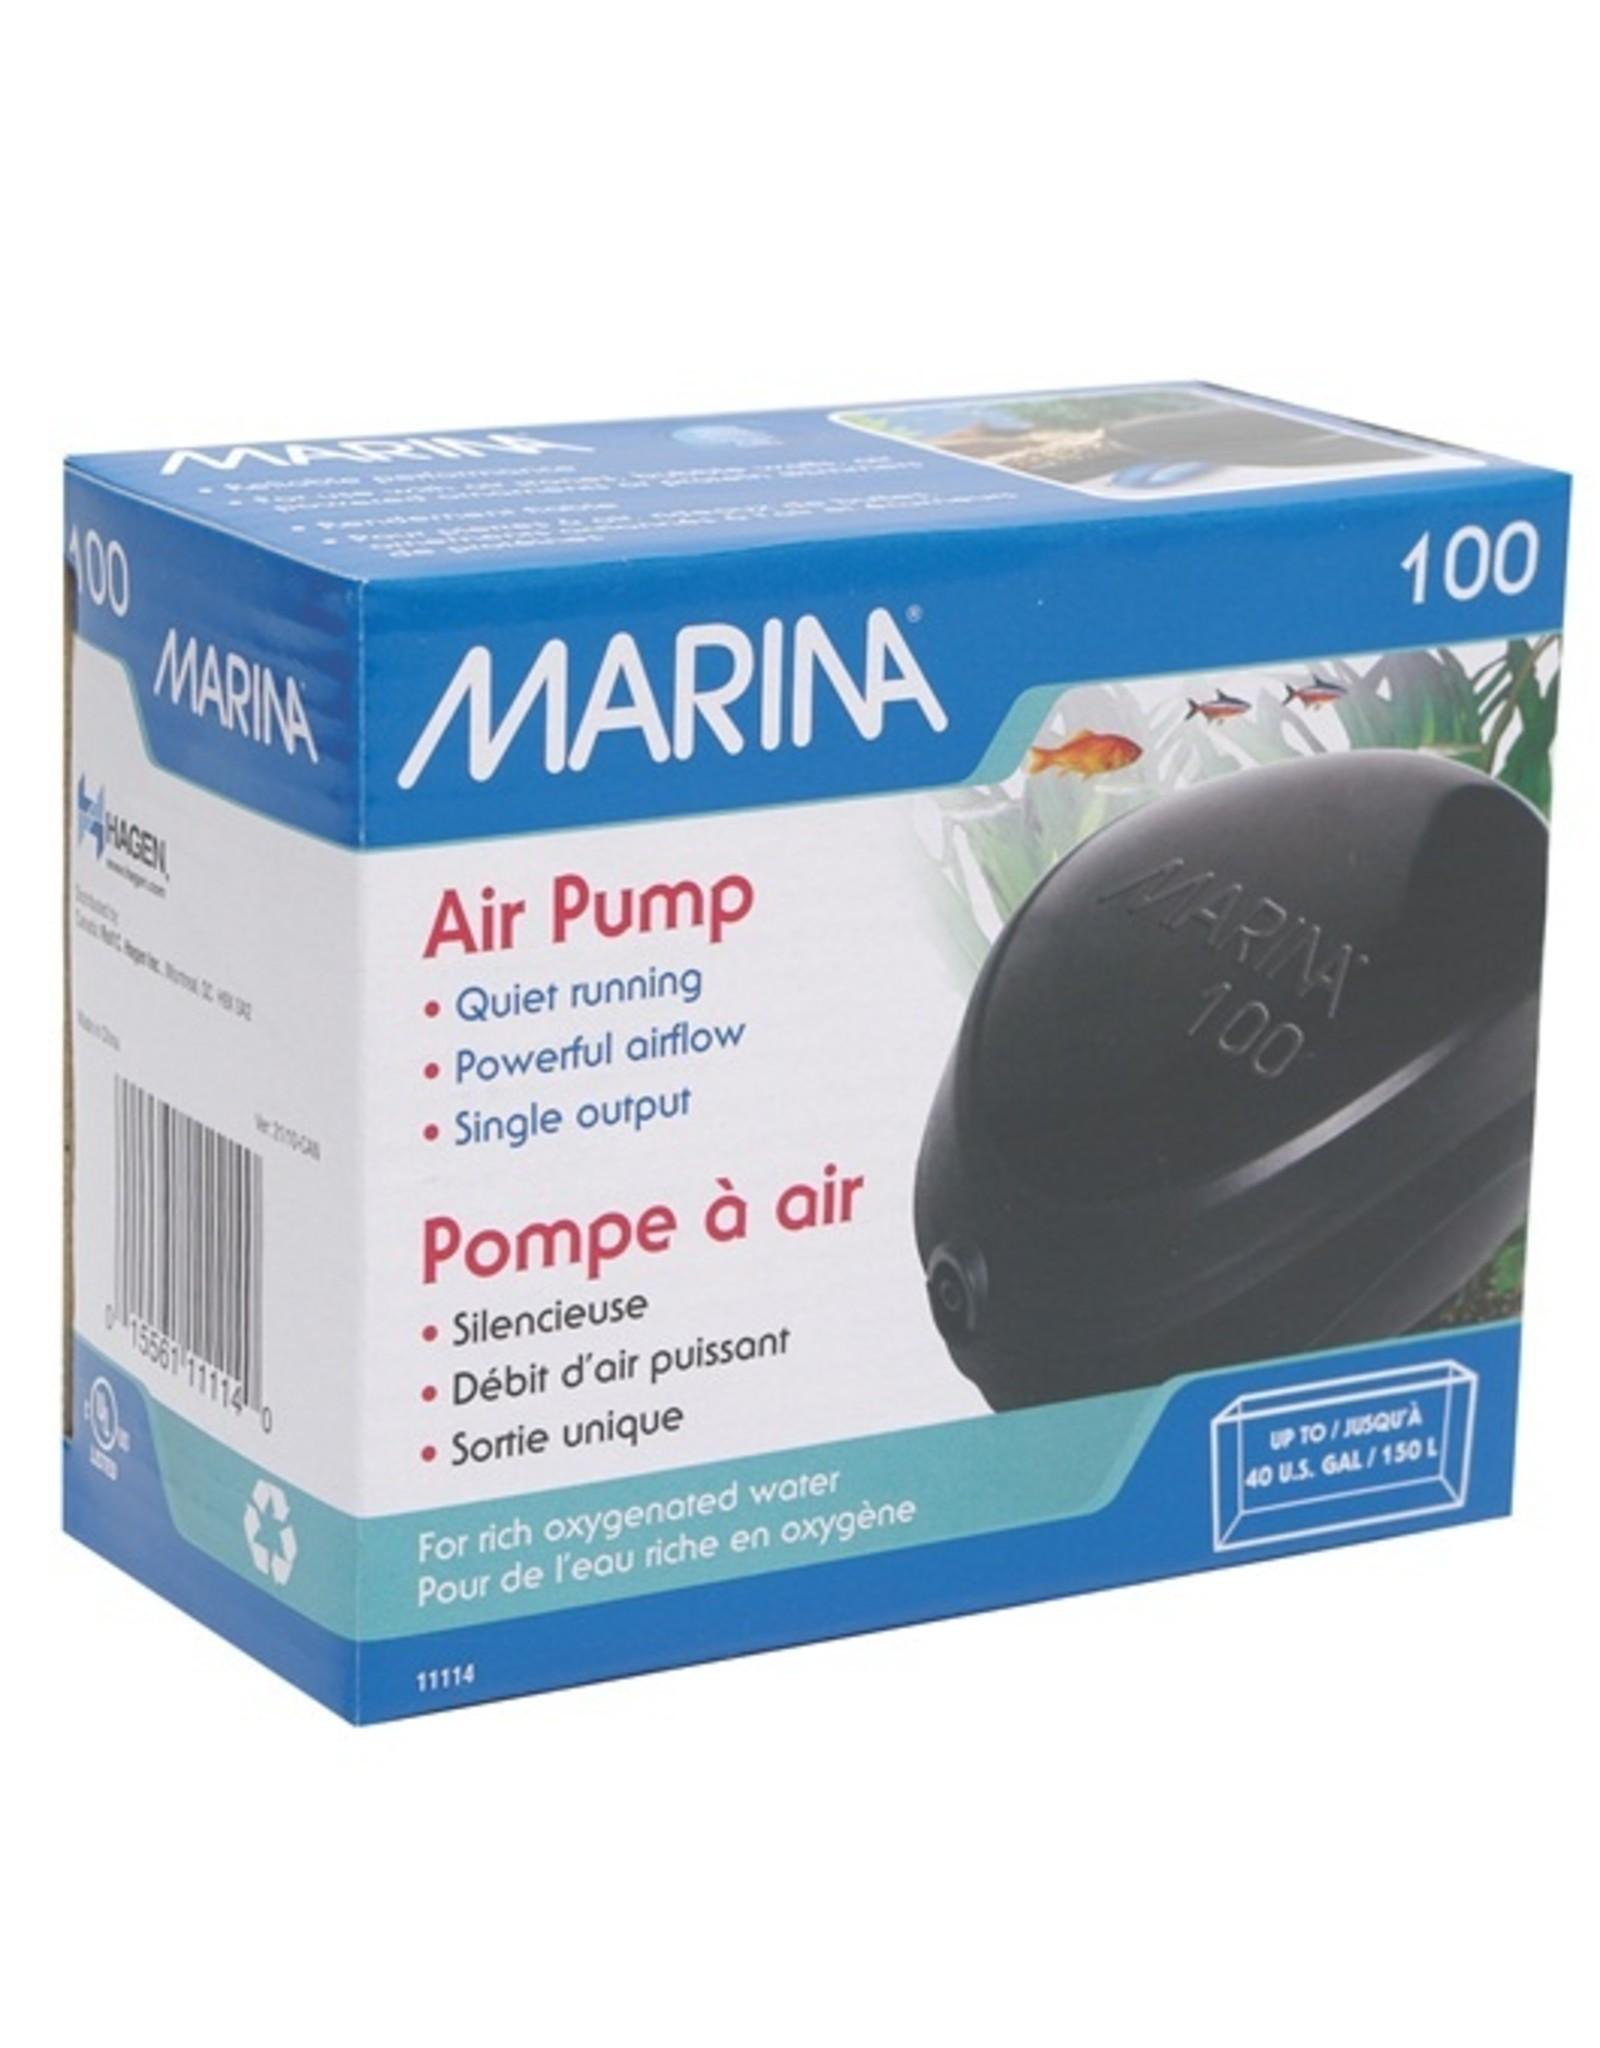 Marina MARINA Air Pump